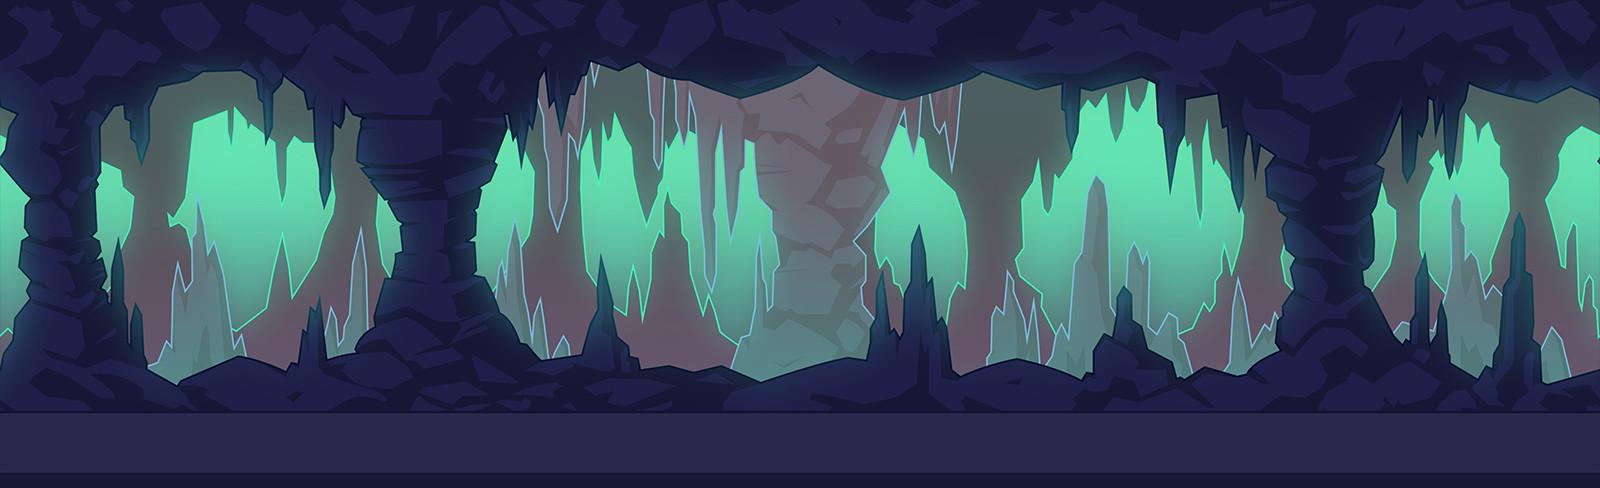 Priscilla firstenberg cave